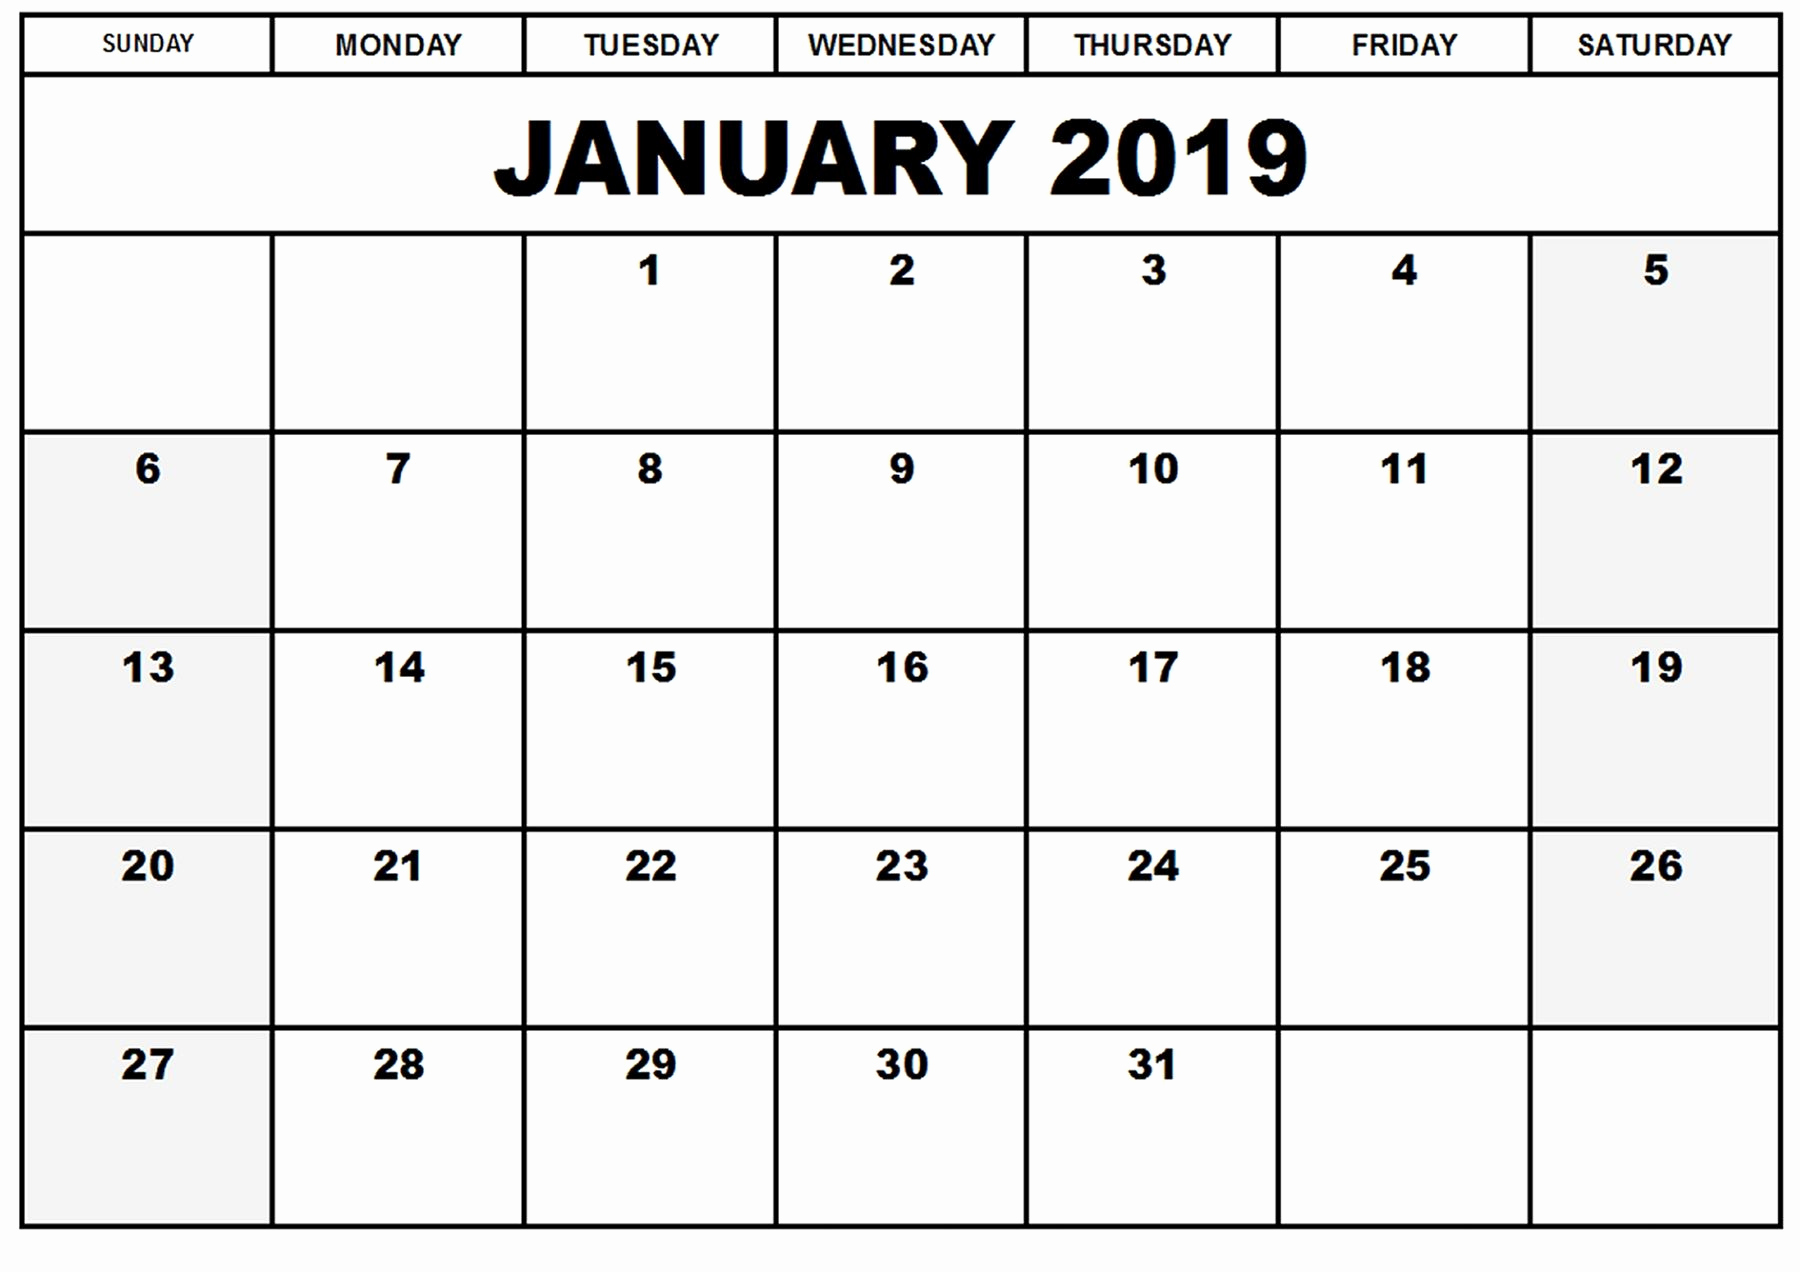 Blank Calendar Template 2019 Lovely Blank Printable Calendar January 2019